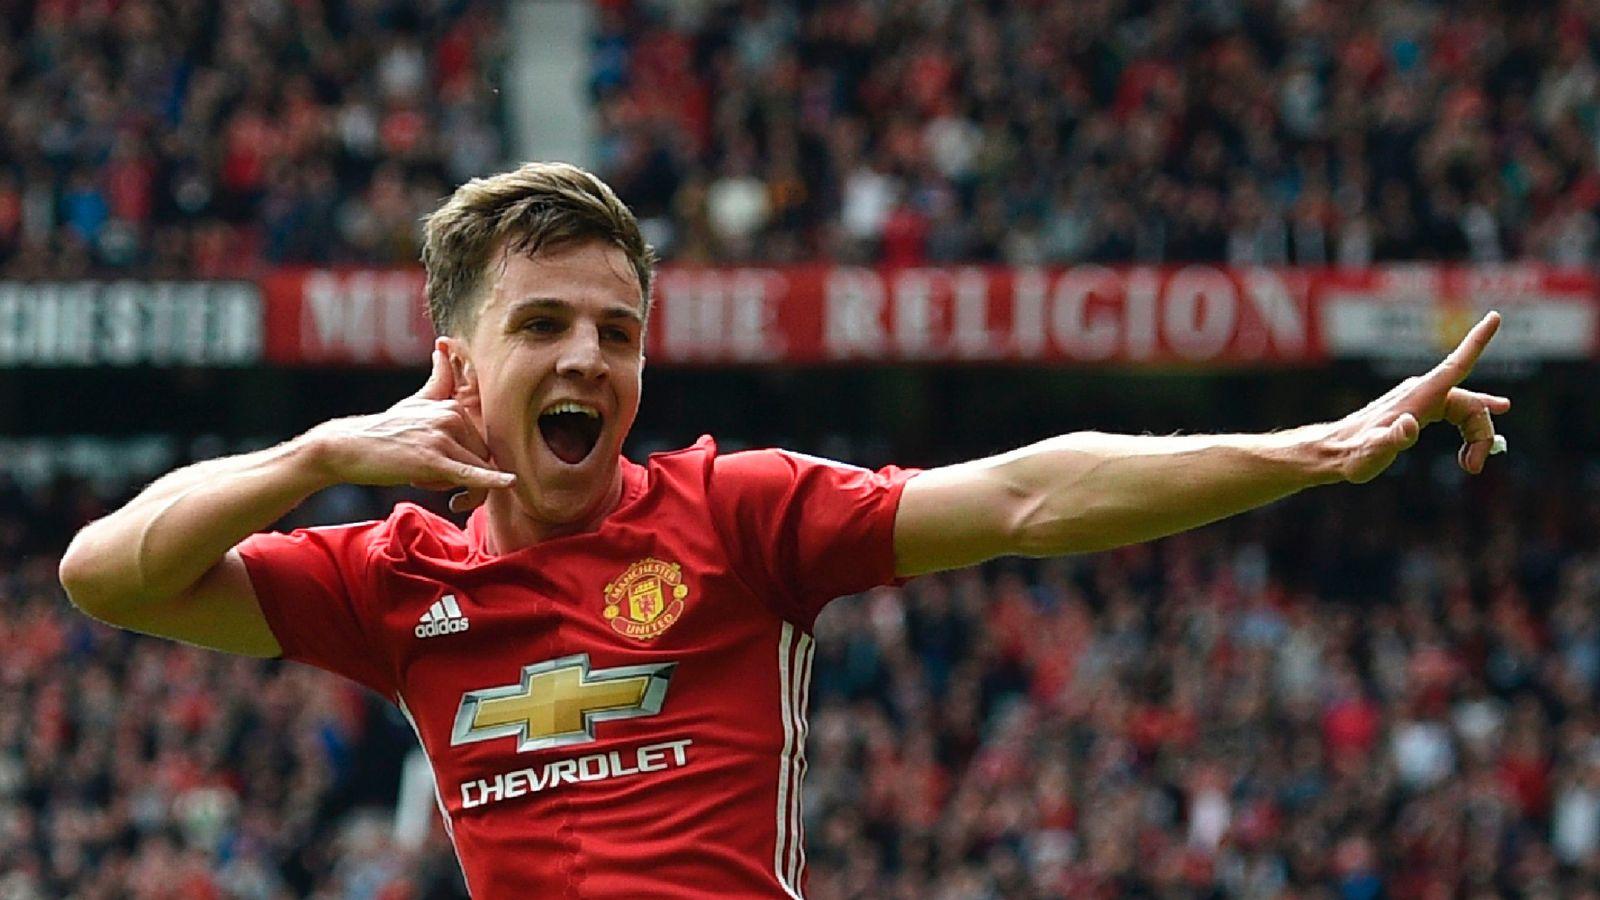 Man Utd 2 0 C Palace Match Report & Highlights